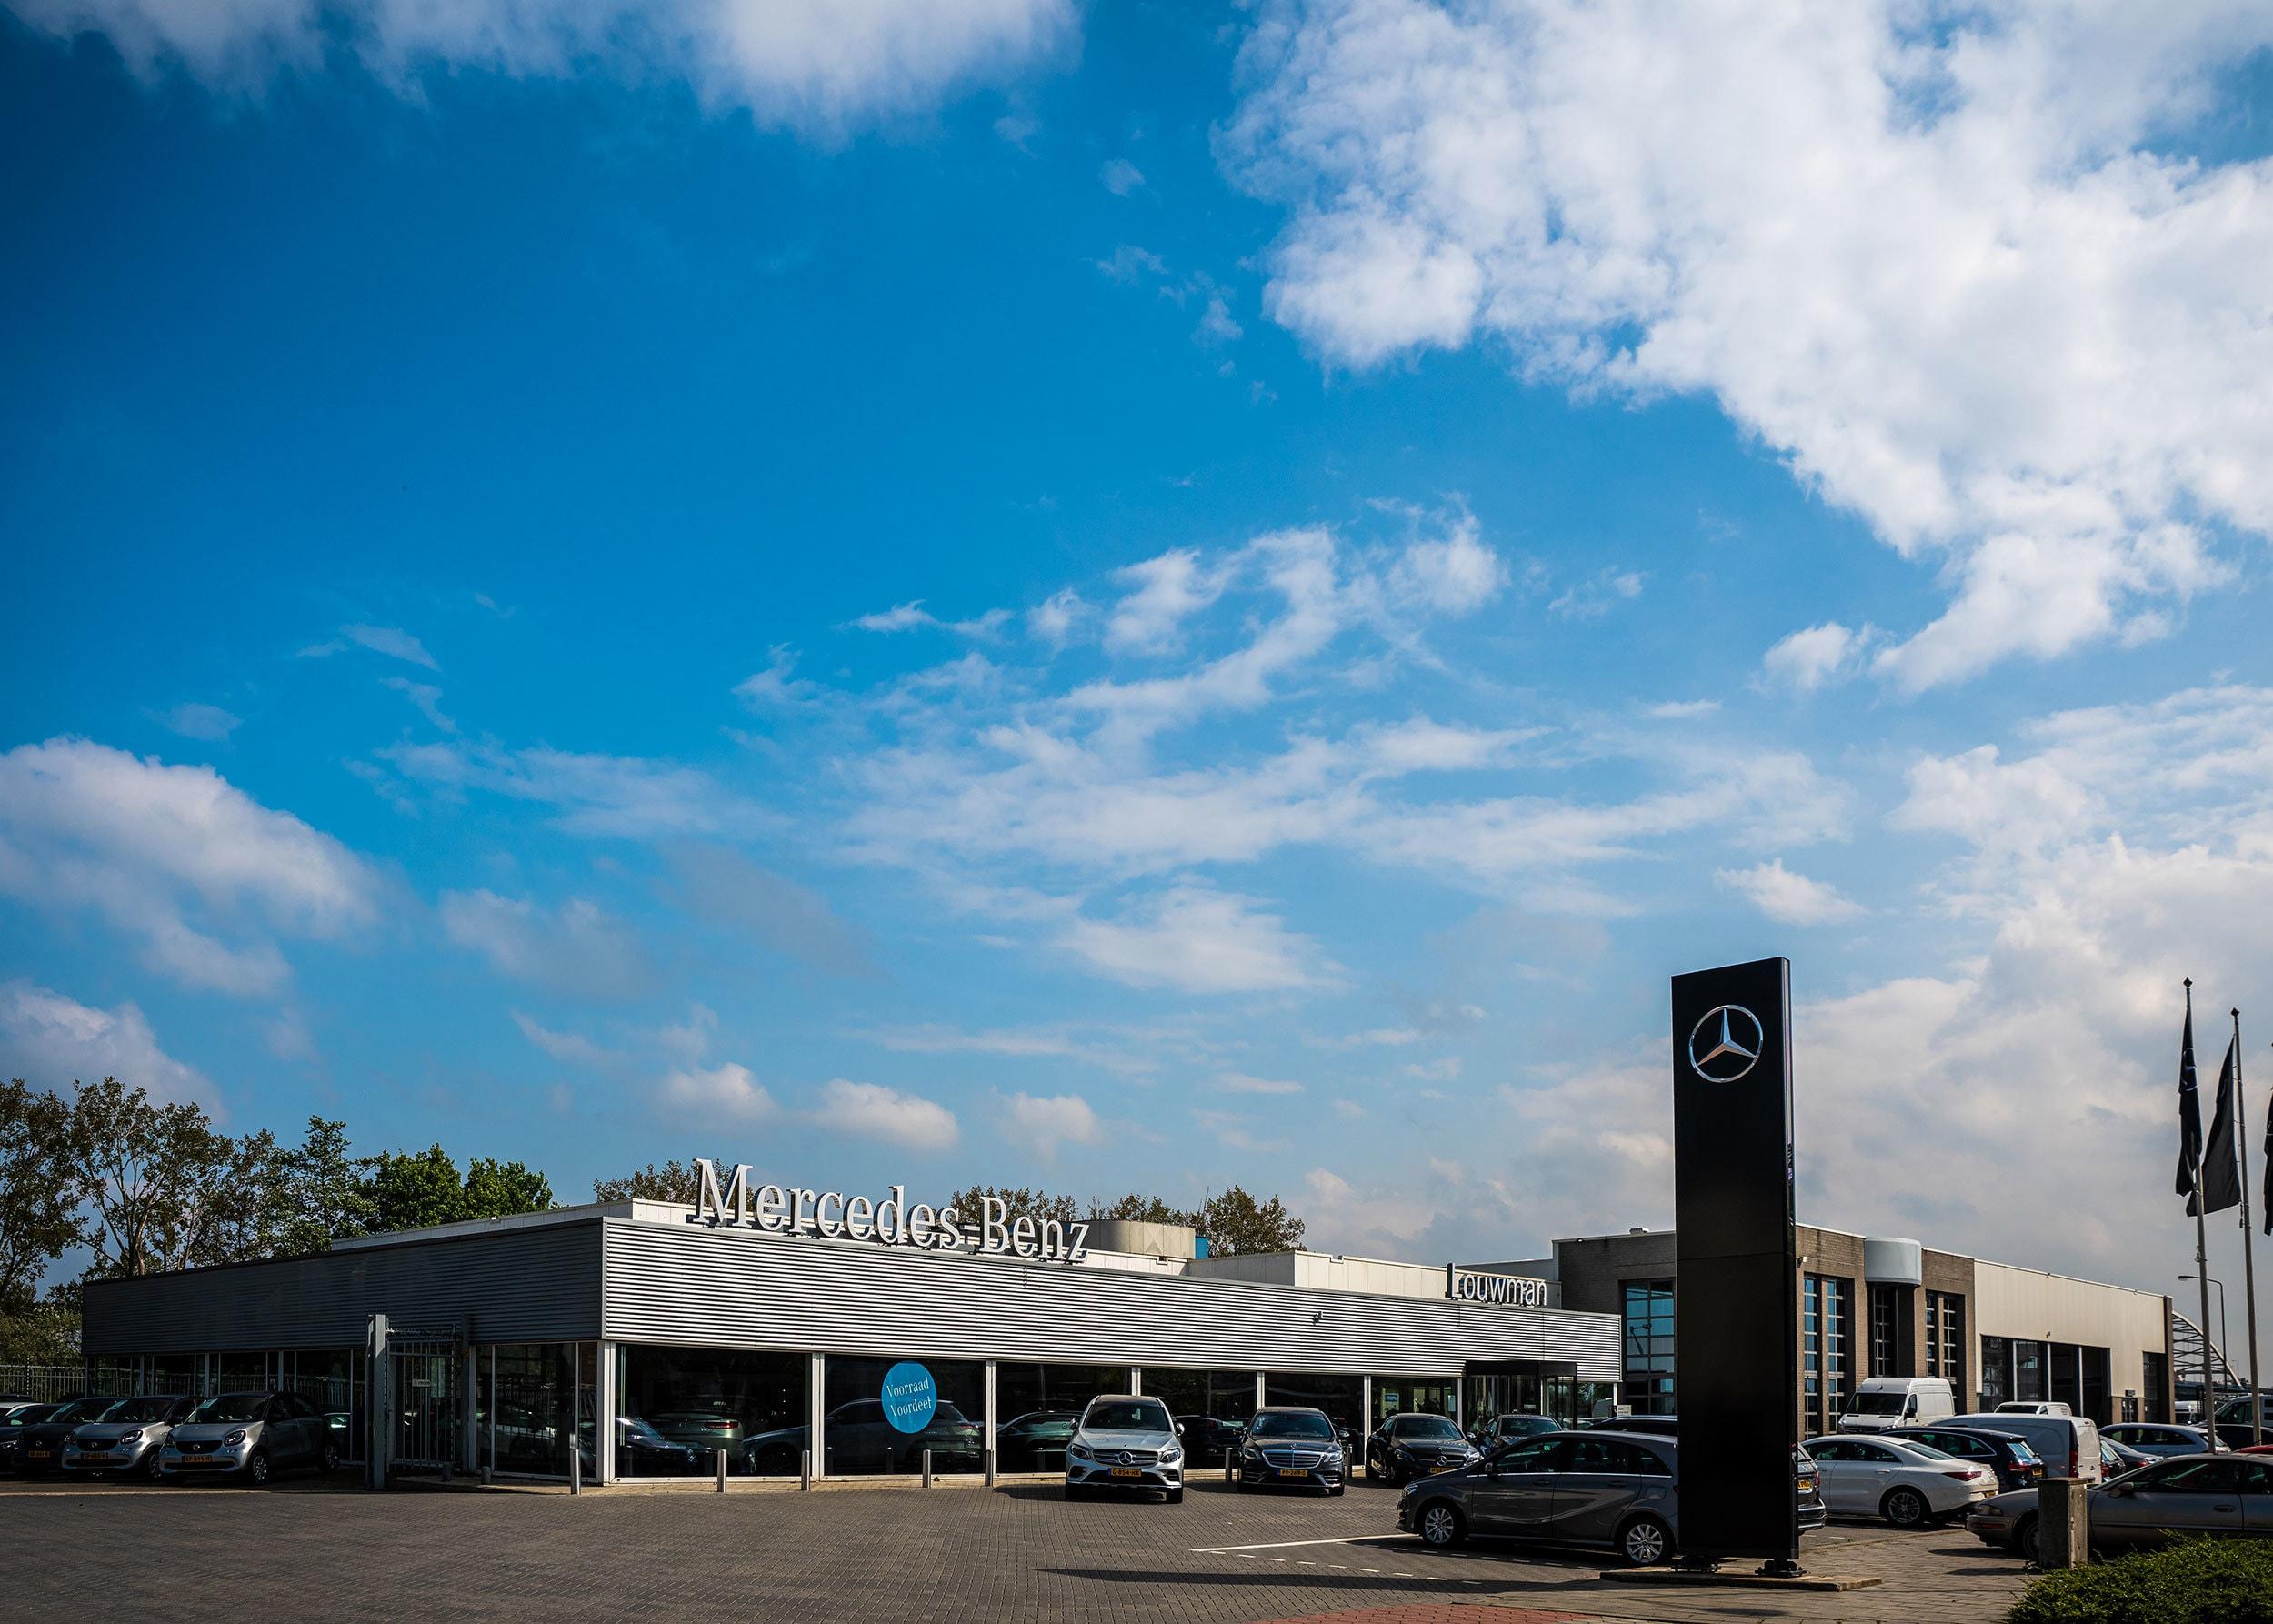 Louwman Mercedes-Benz Personenwagens Gorinchem